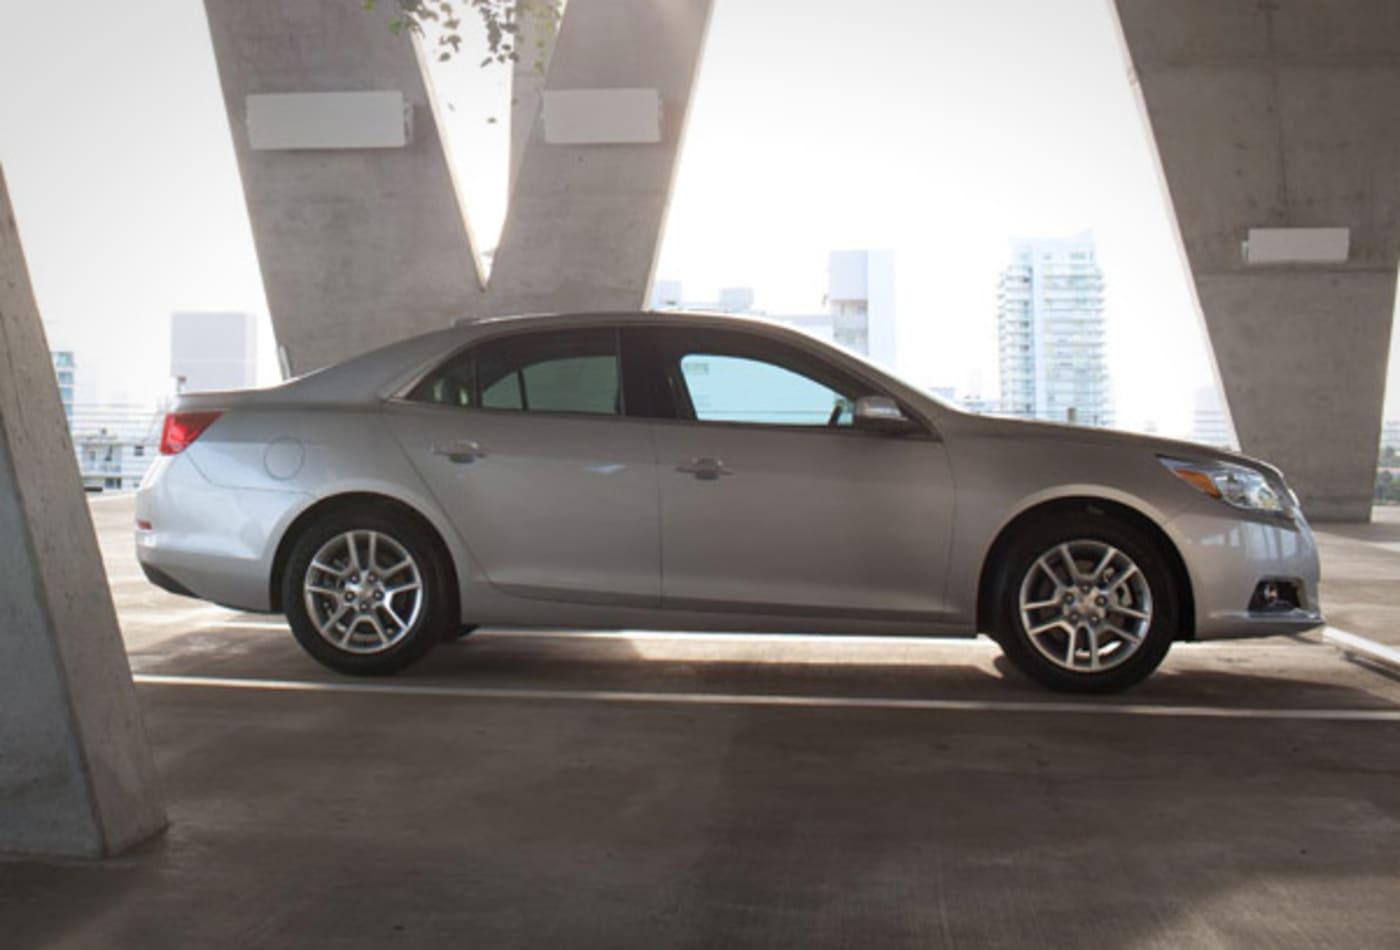 Chevrolet-Malibu-Eco-Best-Cars-Commuting-CNBC.jpg